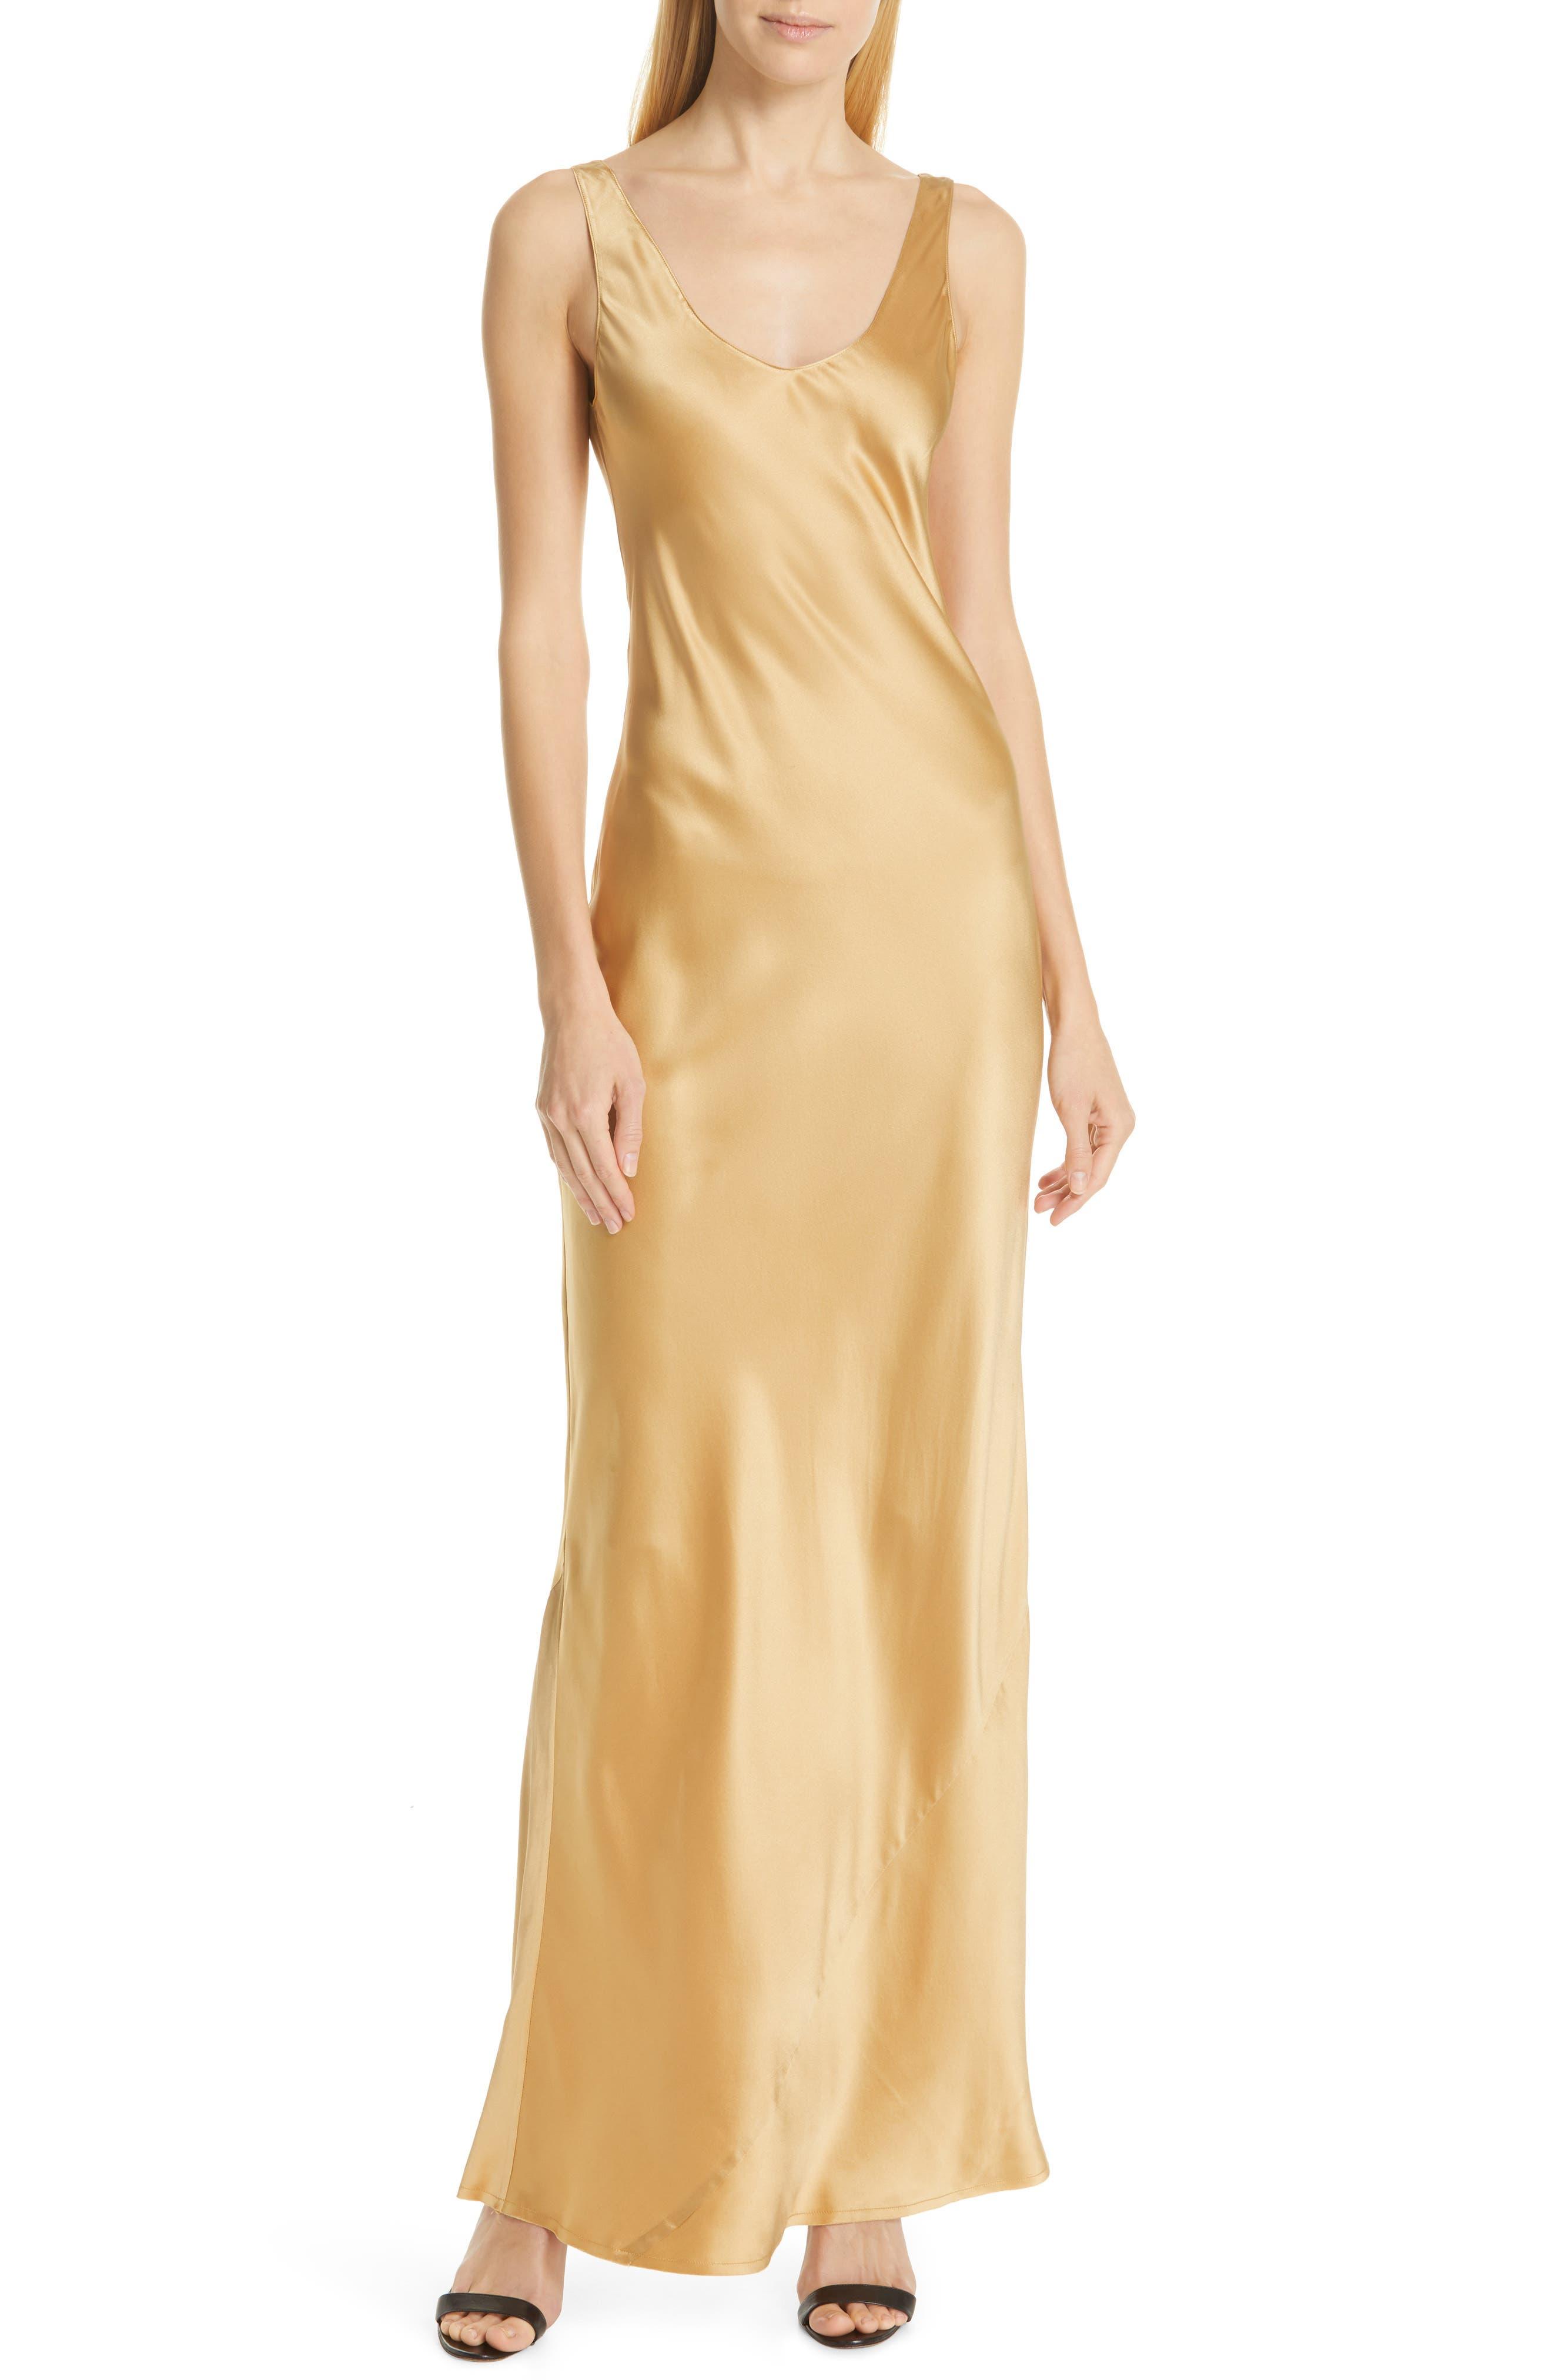 NILI LOTAN, Bazile Silk Evening Dress, Main thumbnail 1, color, GOLDEN